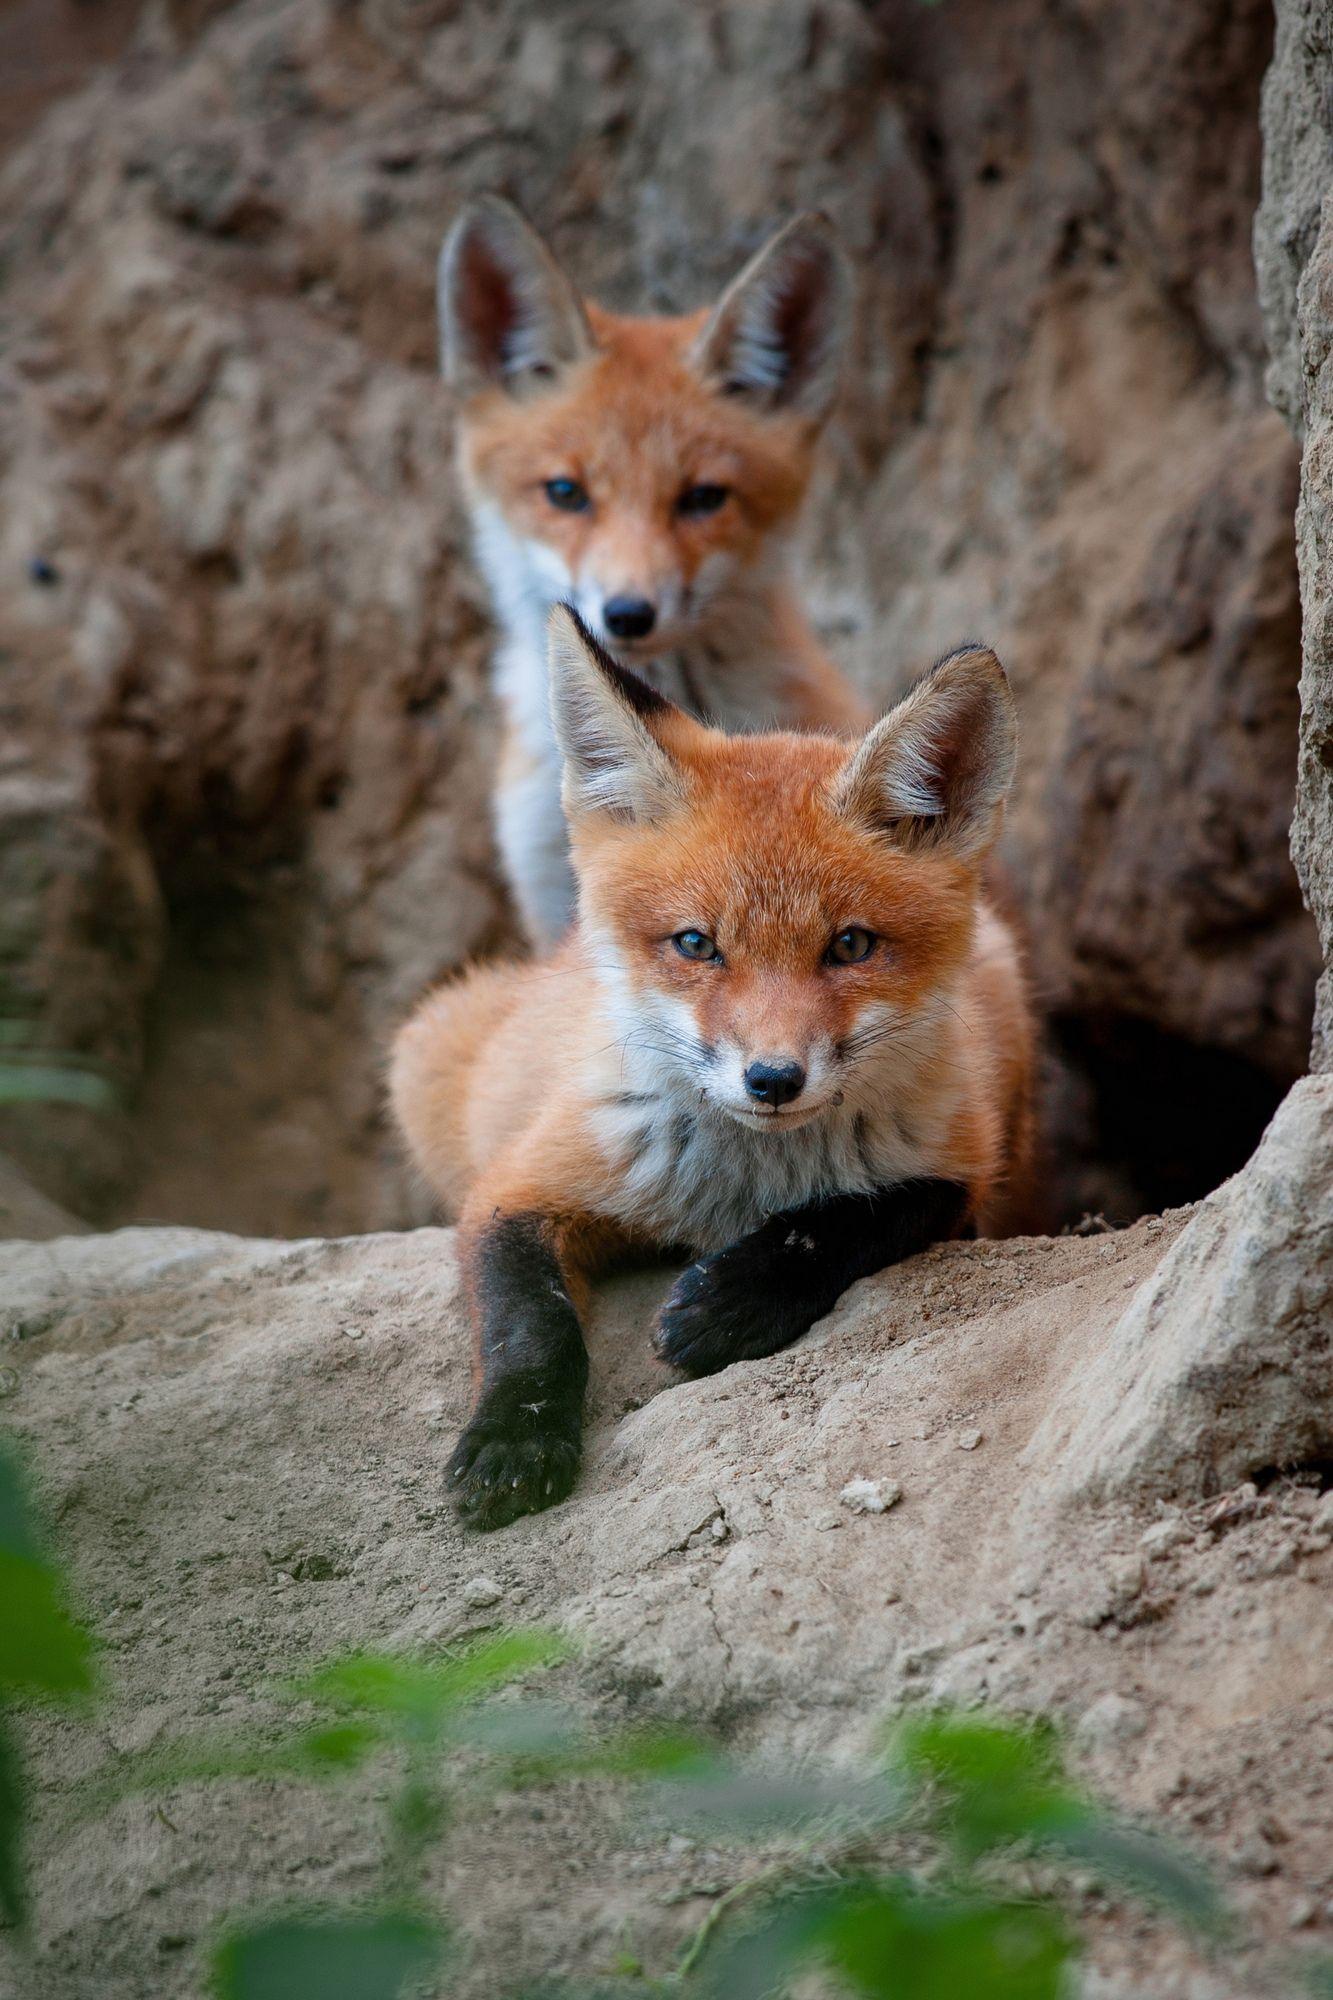 Red Fox Cubs by Alex Drangovsky on 35Photo Лисята